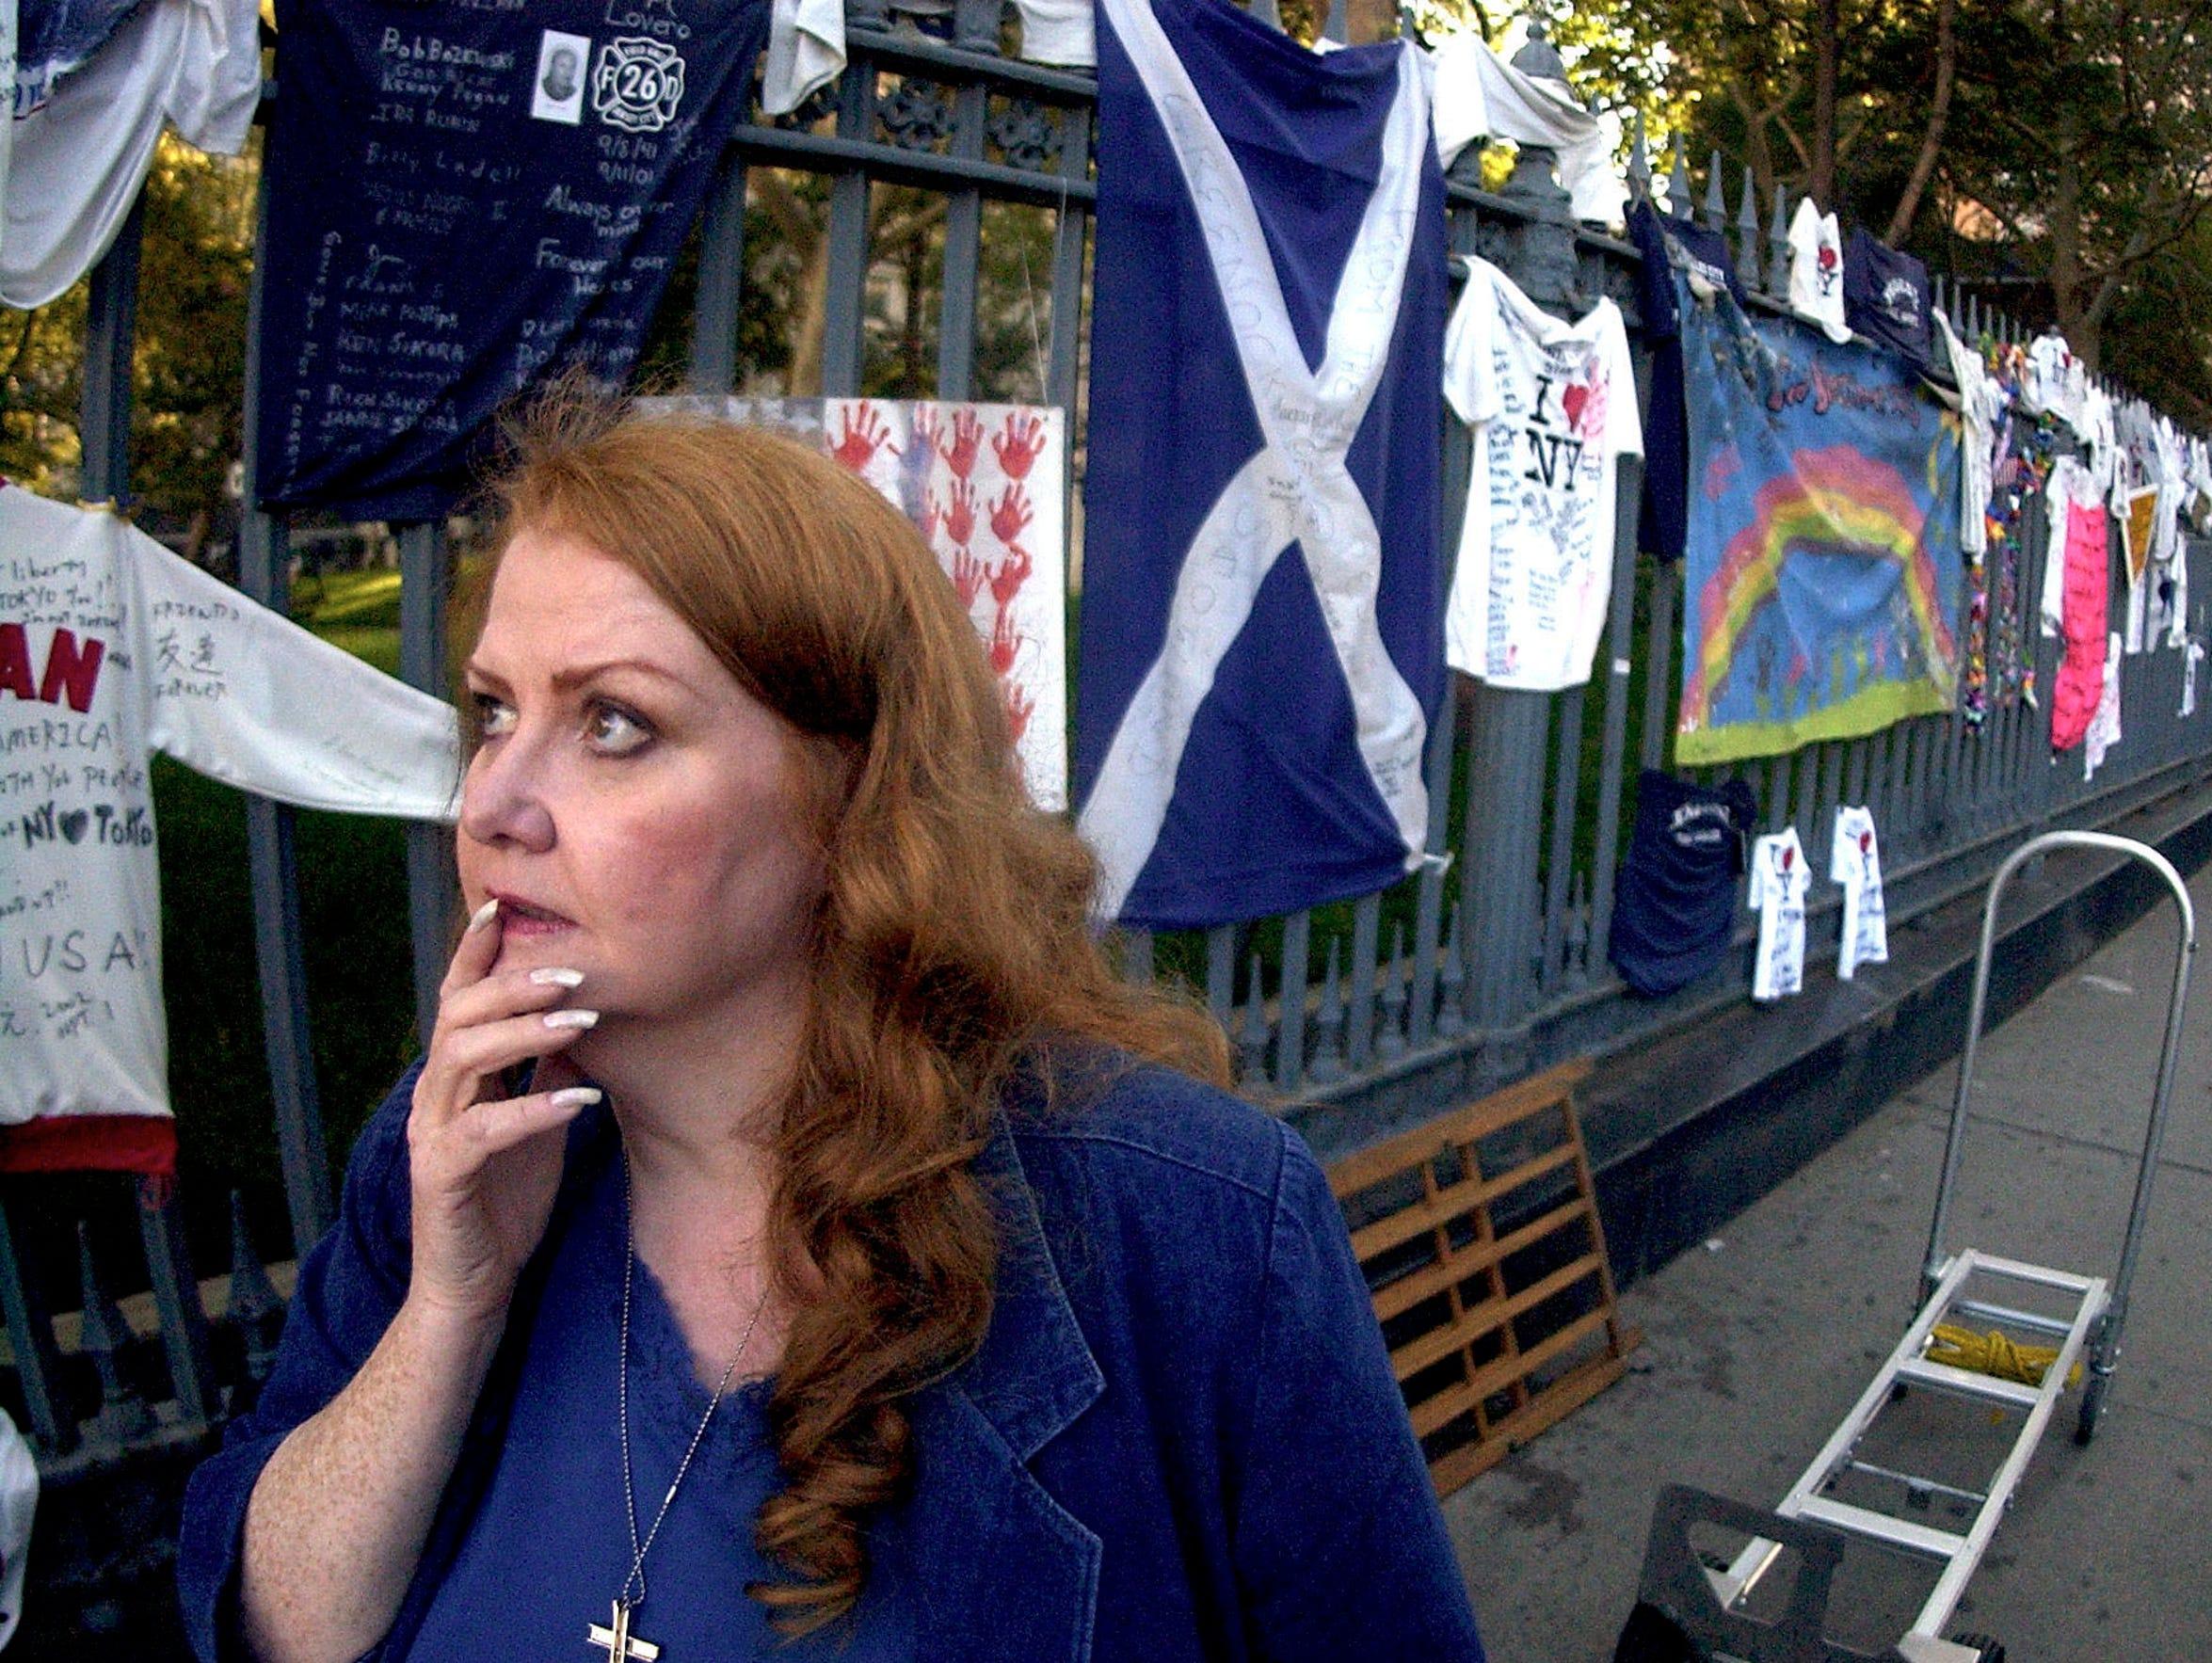 Margaret Gramly looks at Ground Zero